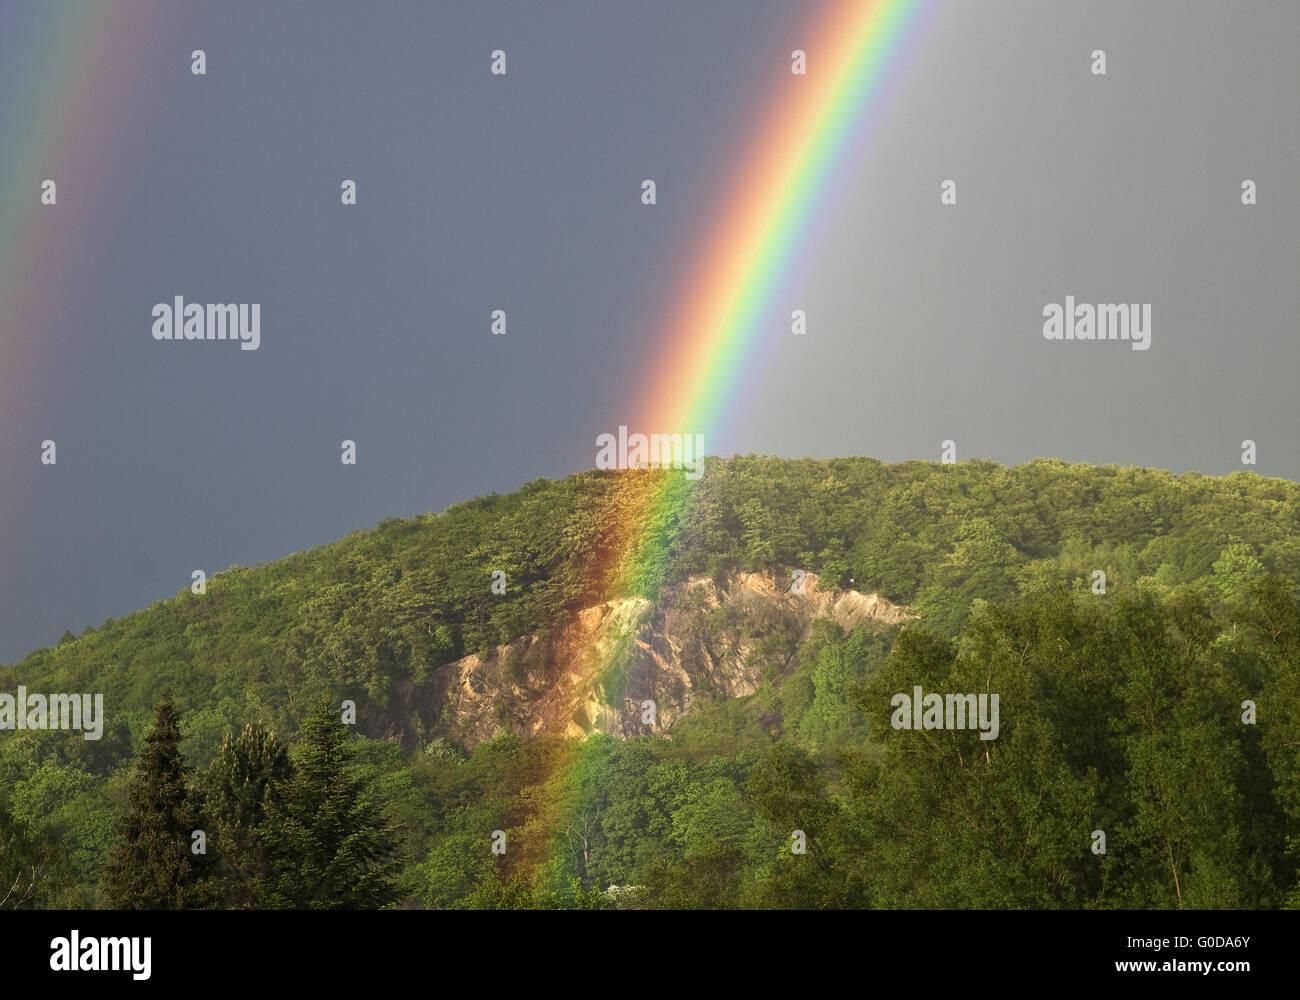 rainbows over Wartenberg, Witten - Stock Image